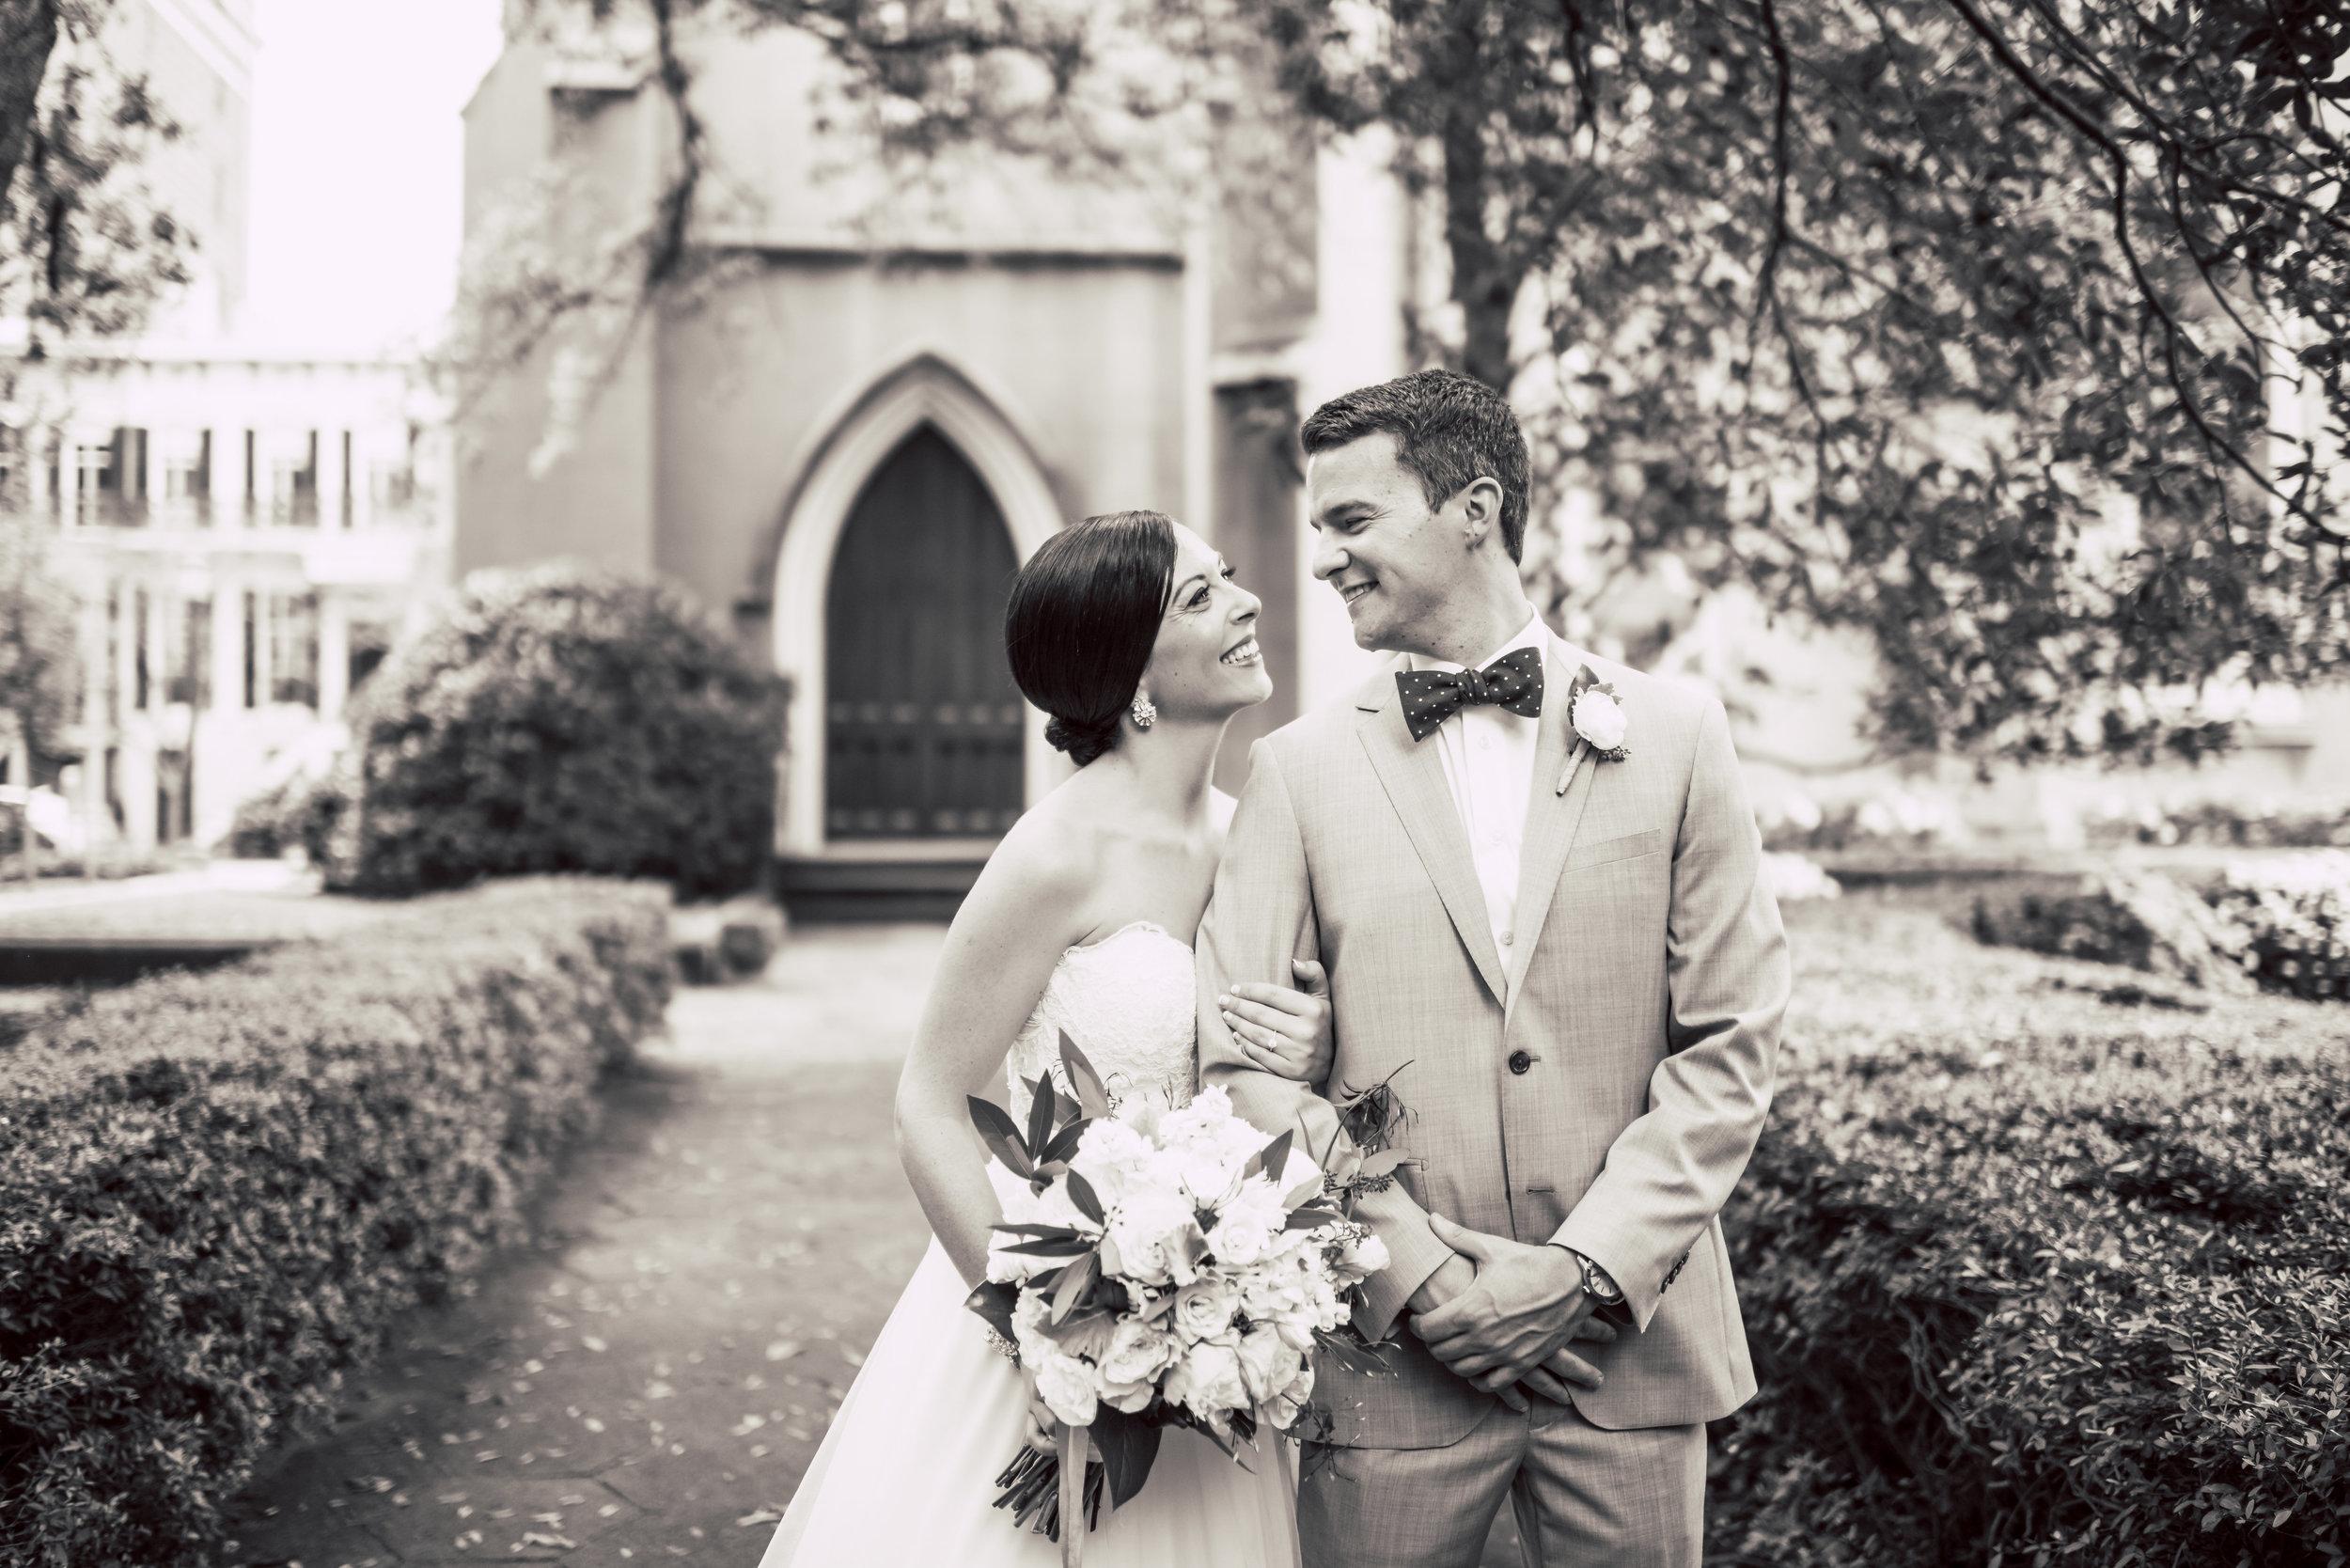 Savannah wedding at Forsyth Park in Georgia